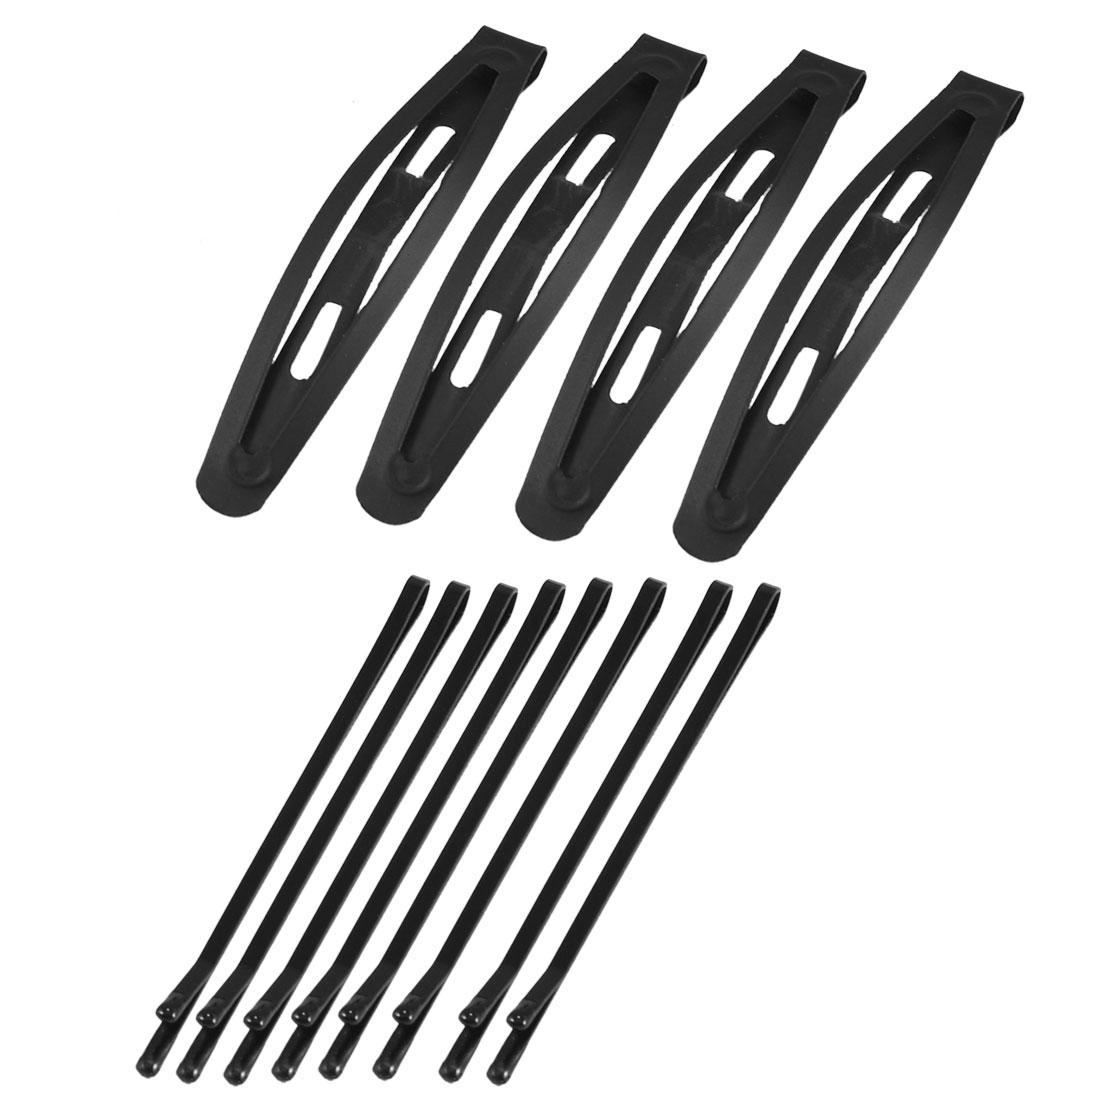 Ladies DIY Hairdo Black Metal Hairpins Bow Prong Bobby Pins 12 in 1